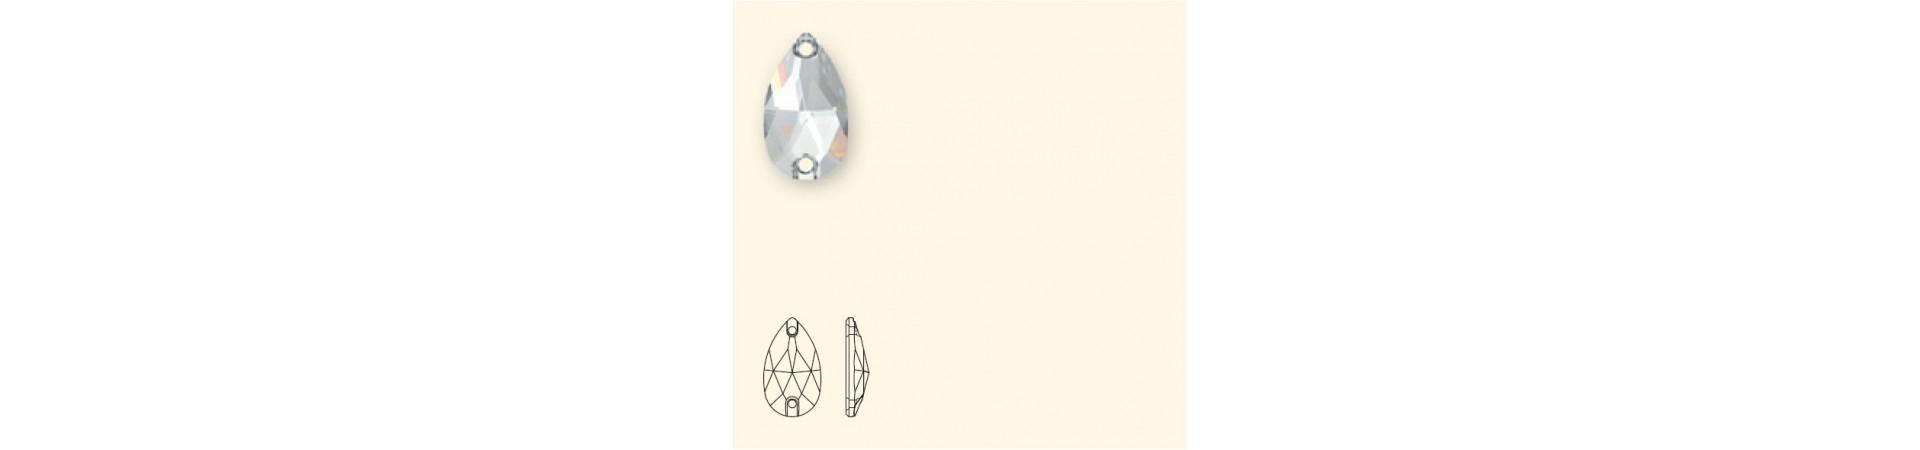 Drop 3230 (Tilk) Õmbluskivid